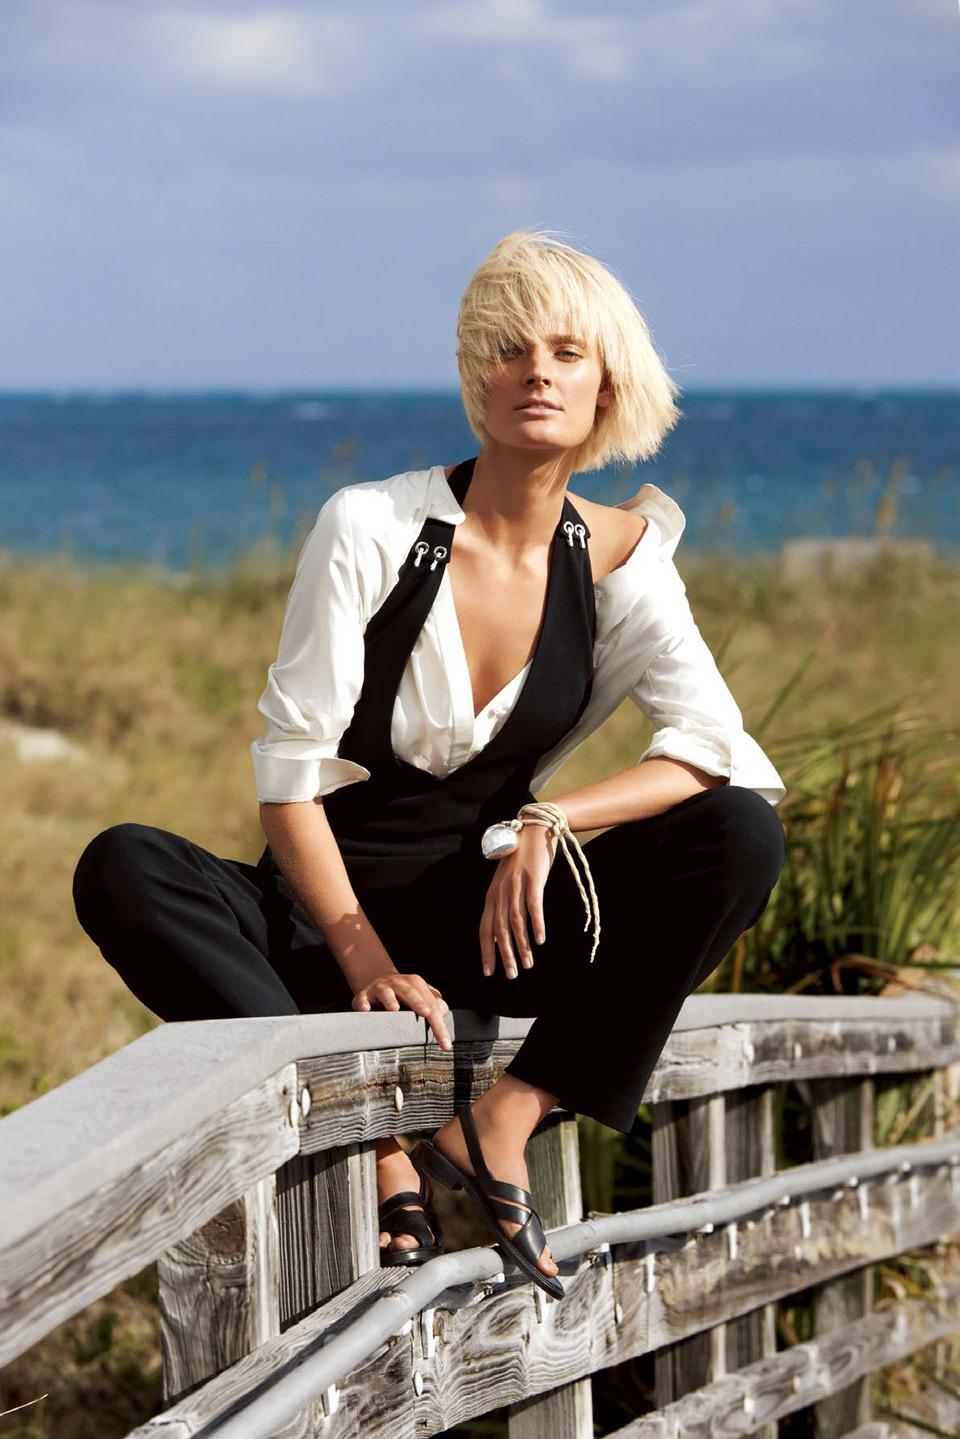 Francuzskaya-top-model-Konstans-Yablonski-v-zhurnale-Glamour-8-foto